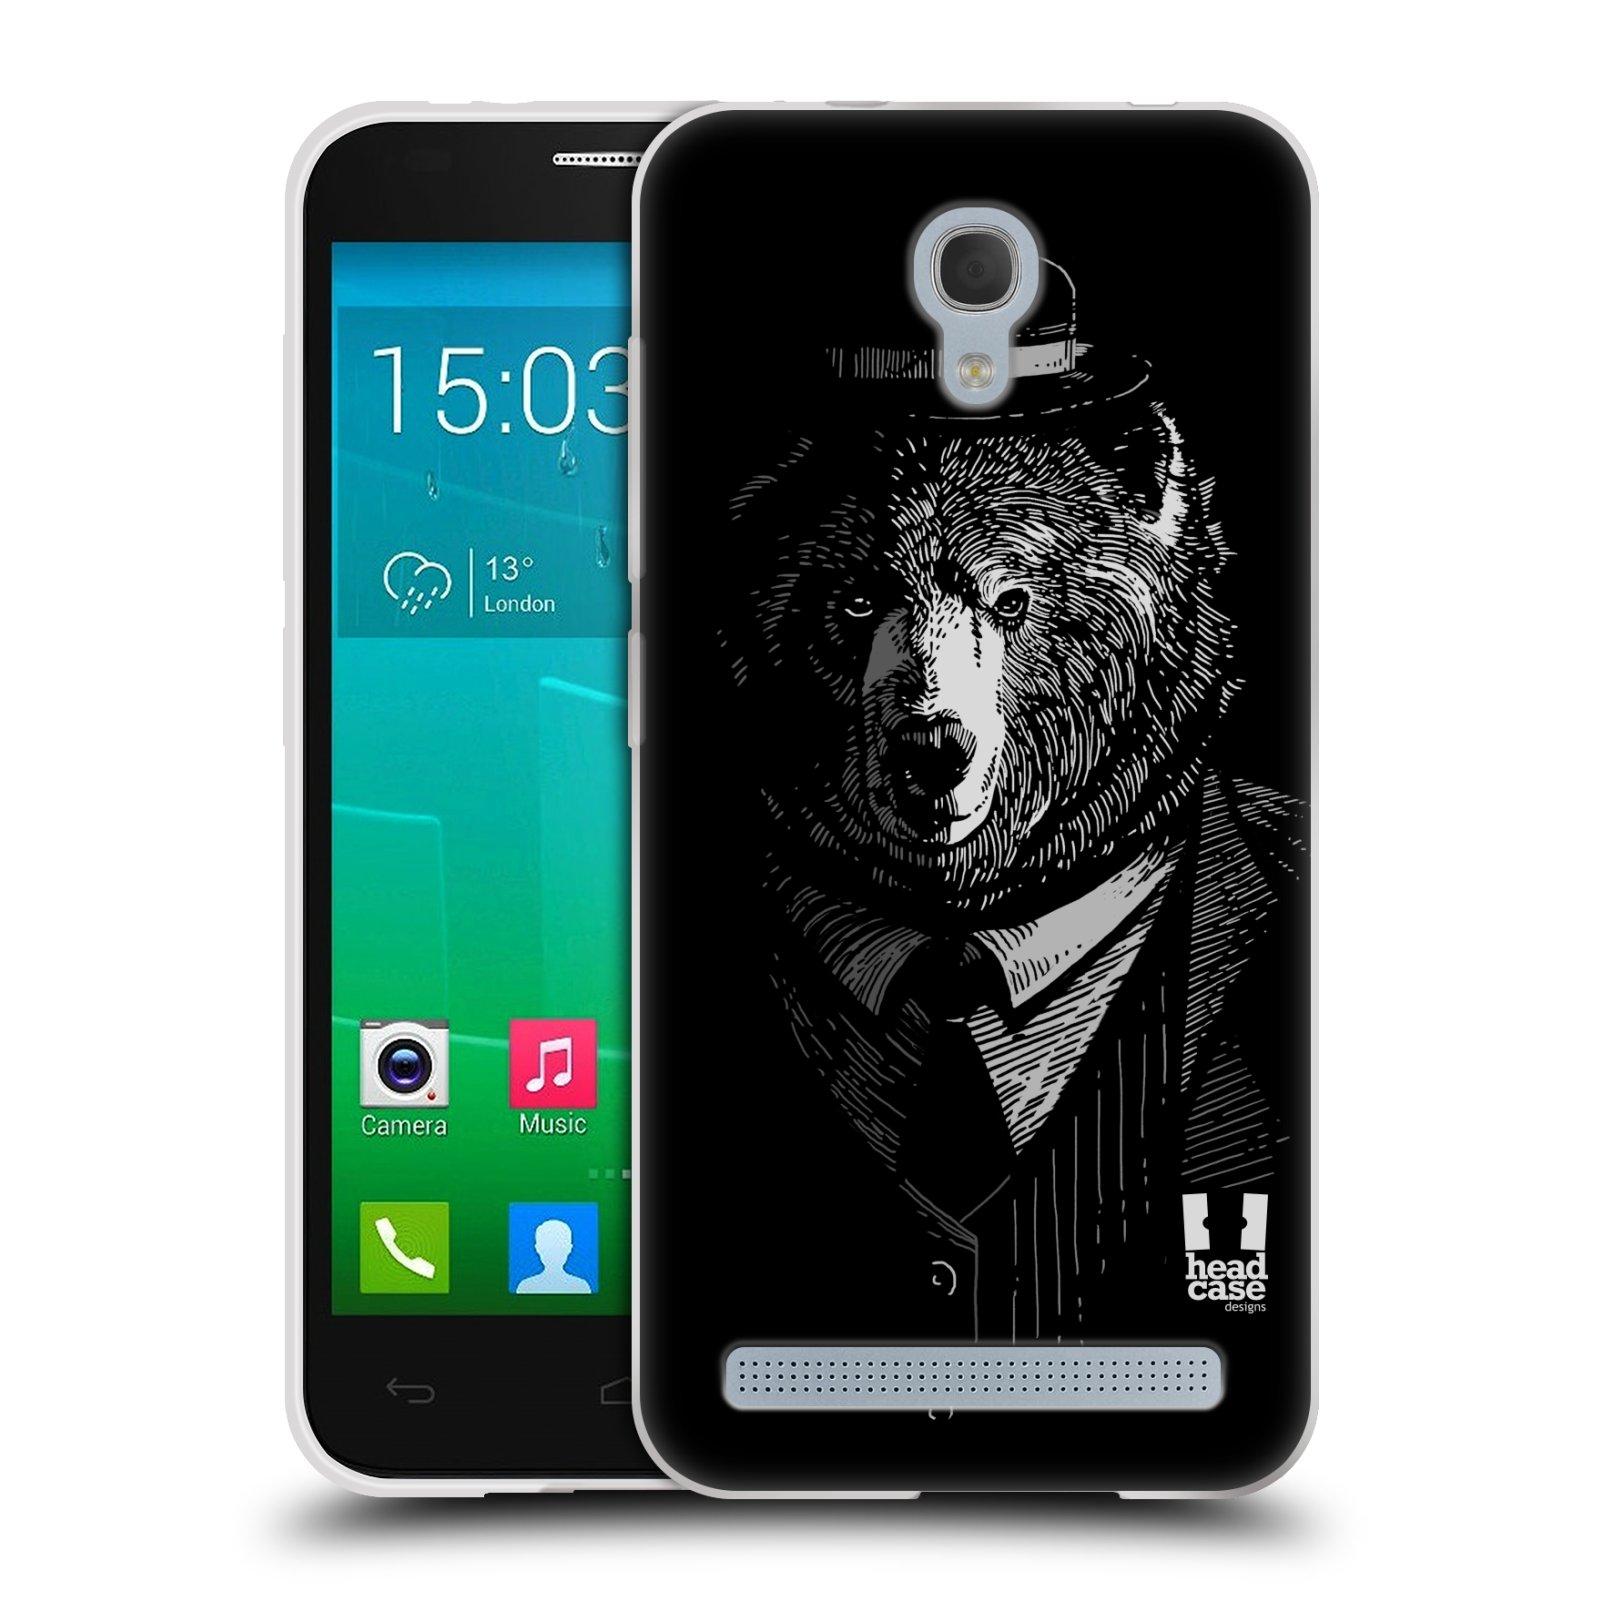 HEAD CASE silikonový obal na mobil Alcatel Idol 2 MINI S 6036Y vzor Zvíře v obleku medvěd